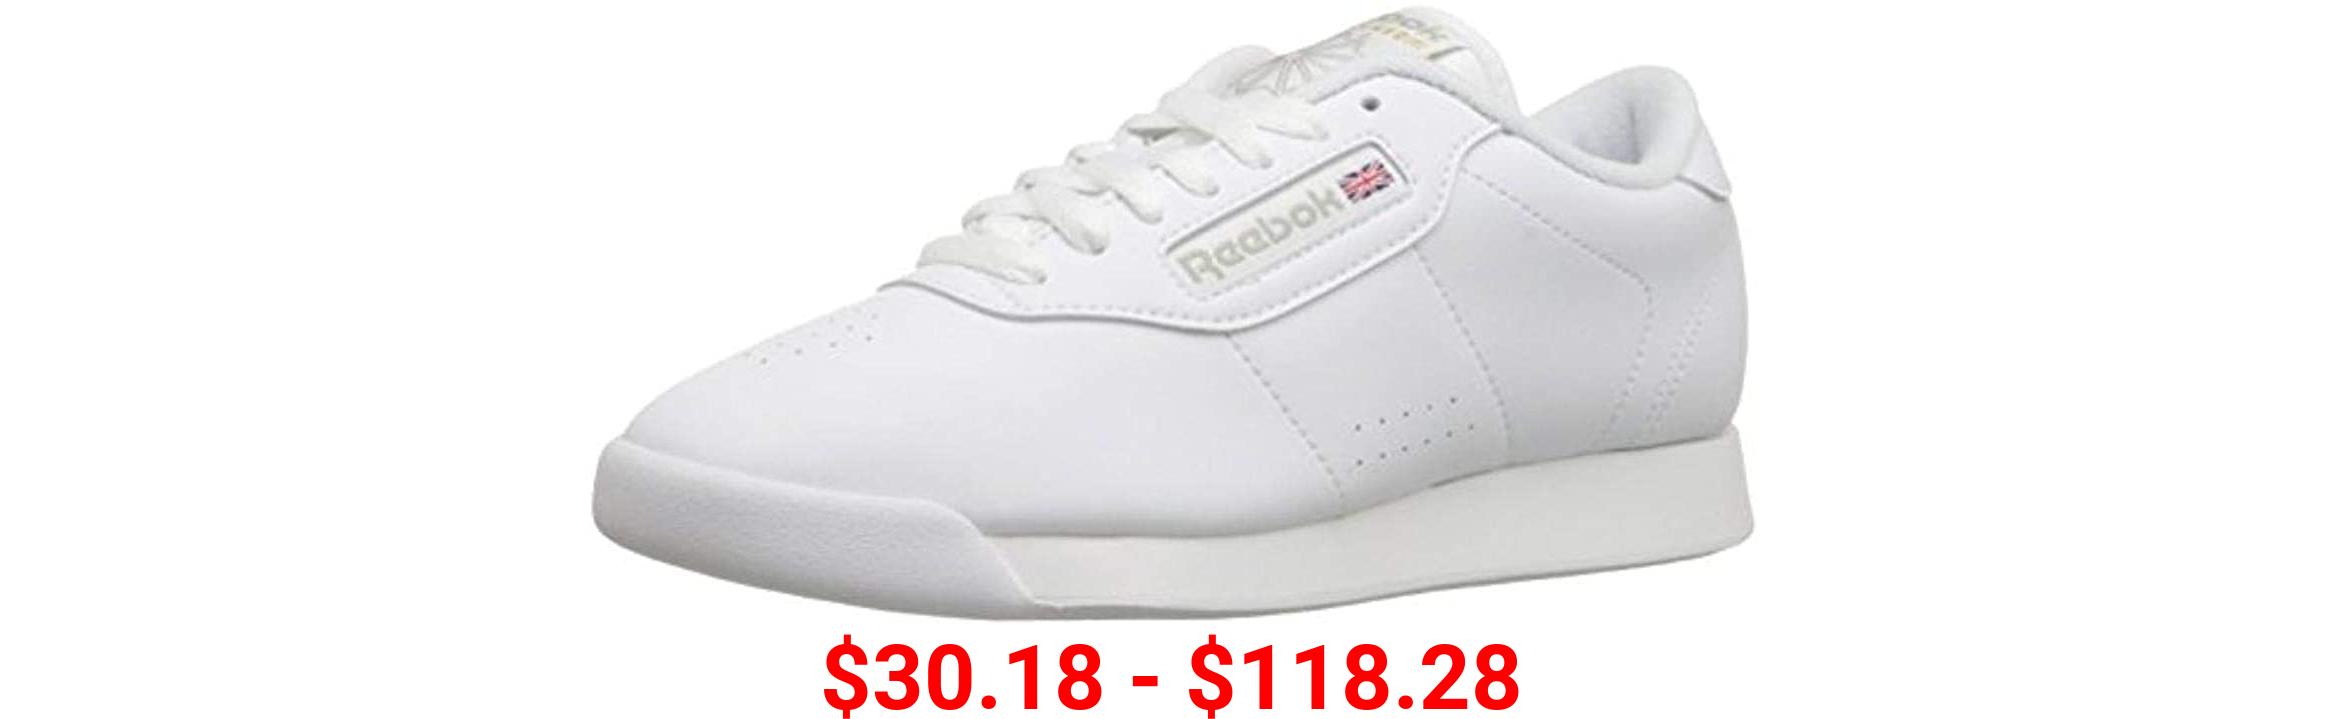 Reebok Women's Princess-Sneaker Casual Joggers